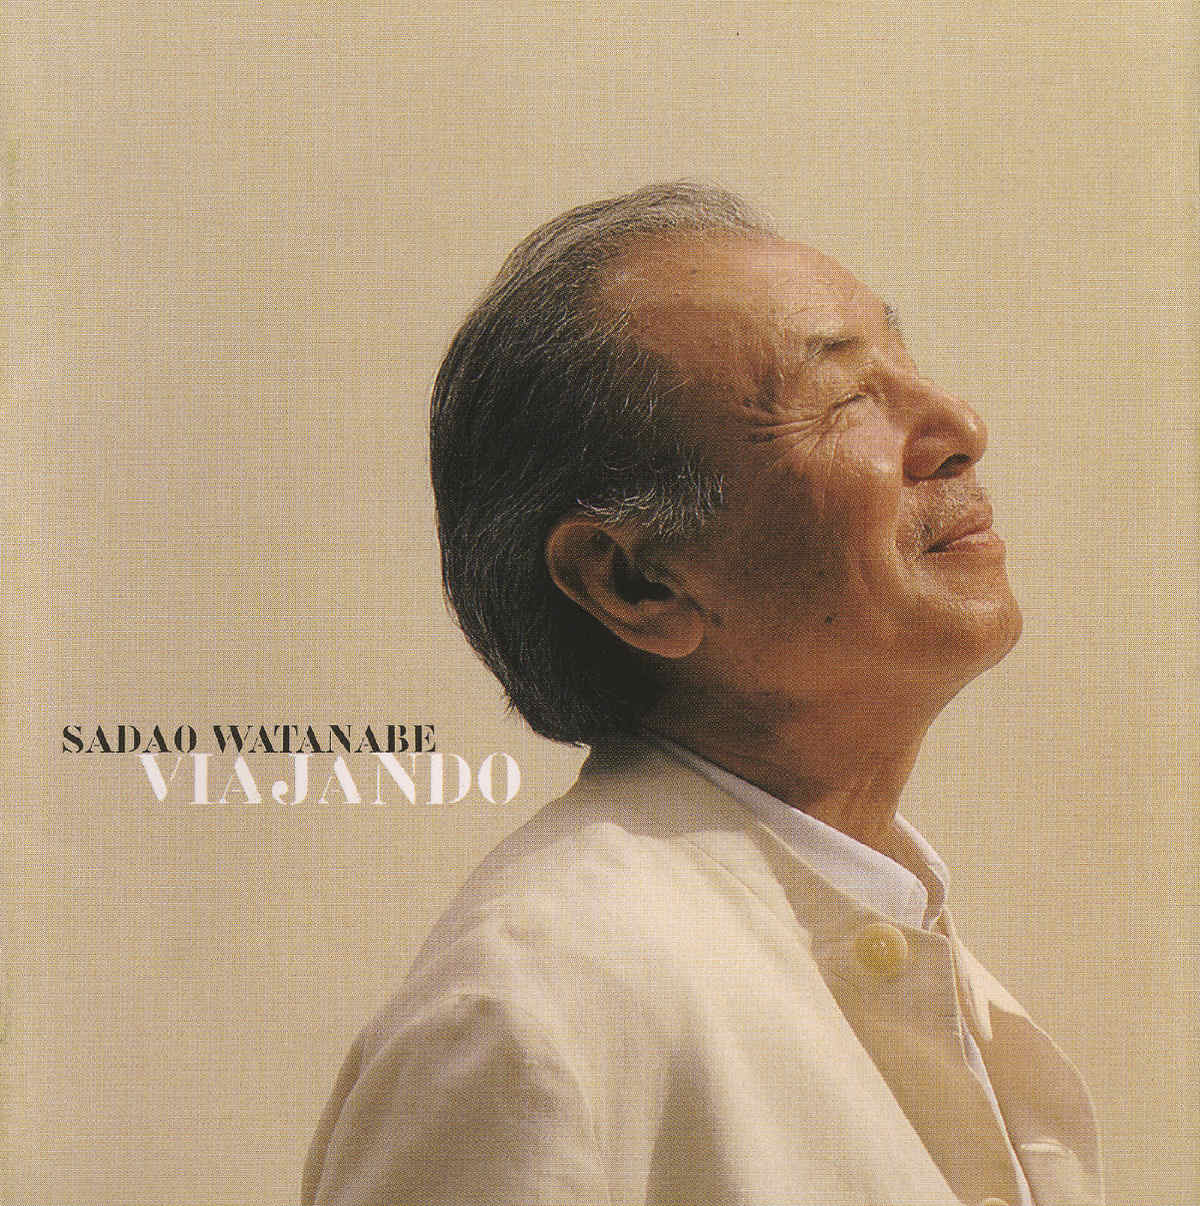 Sadao Watanabe Flac Recutthf